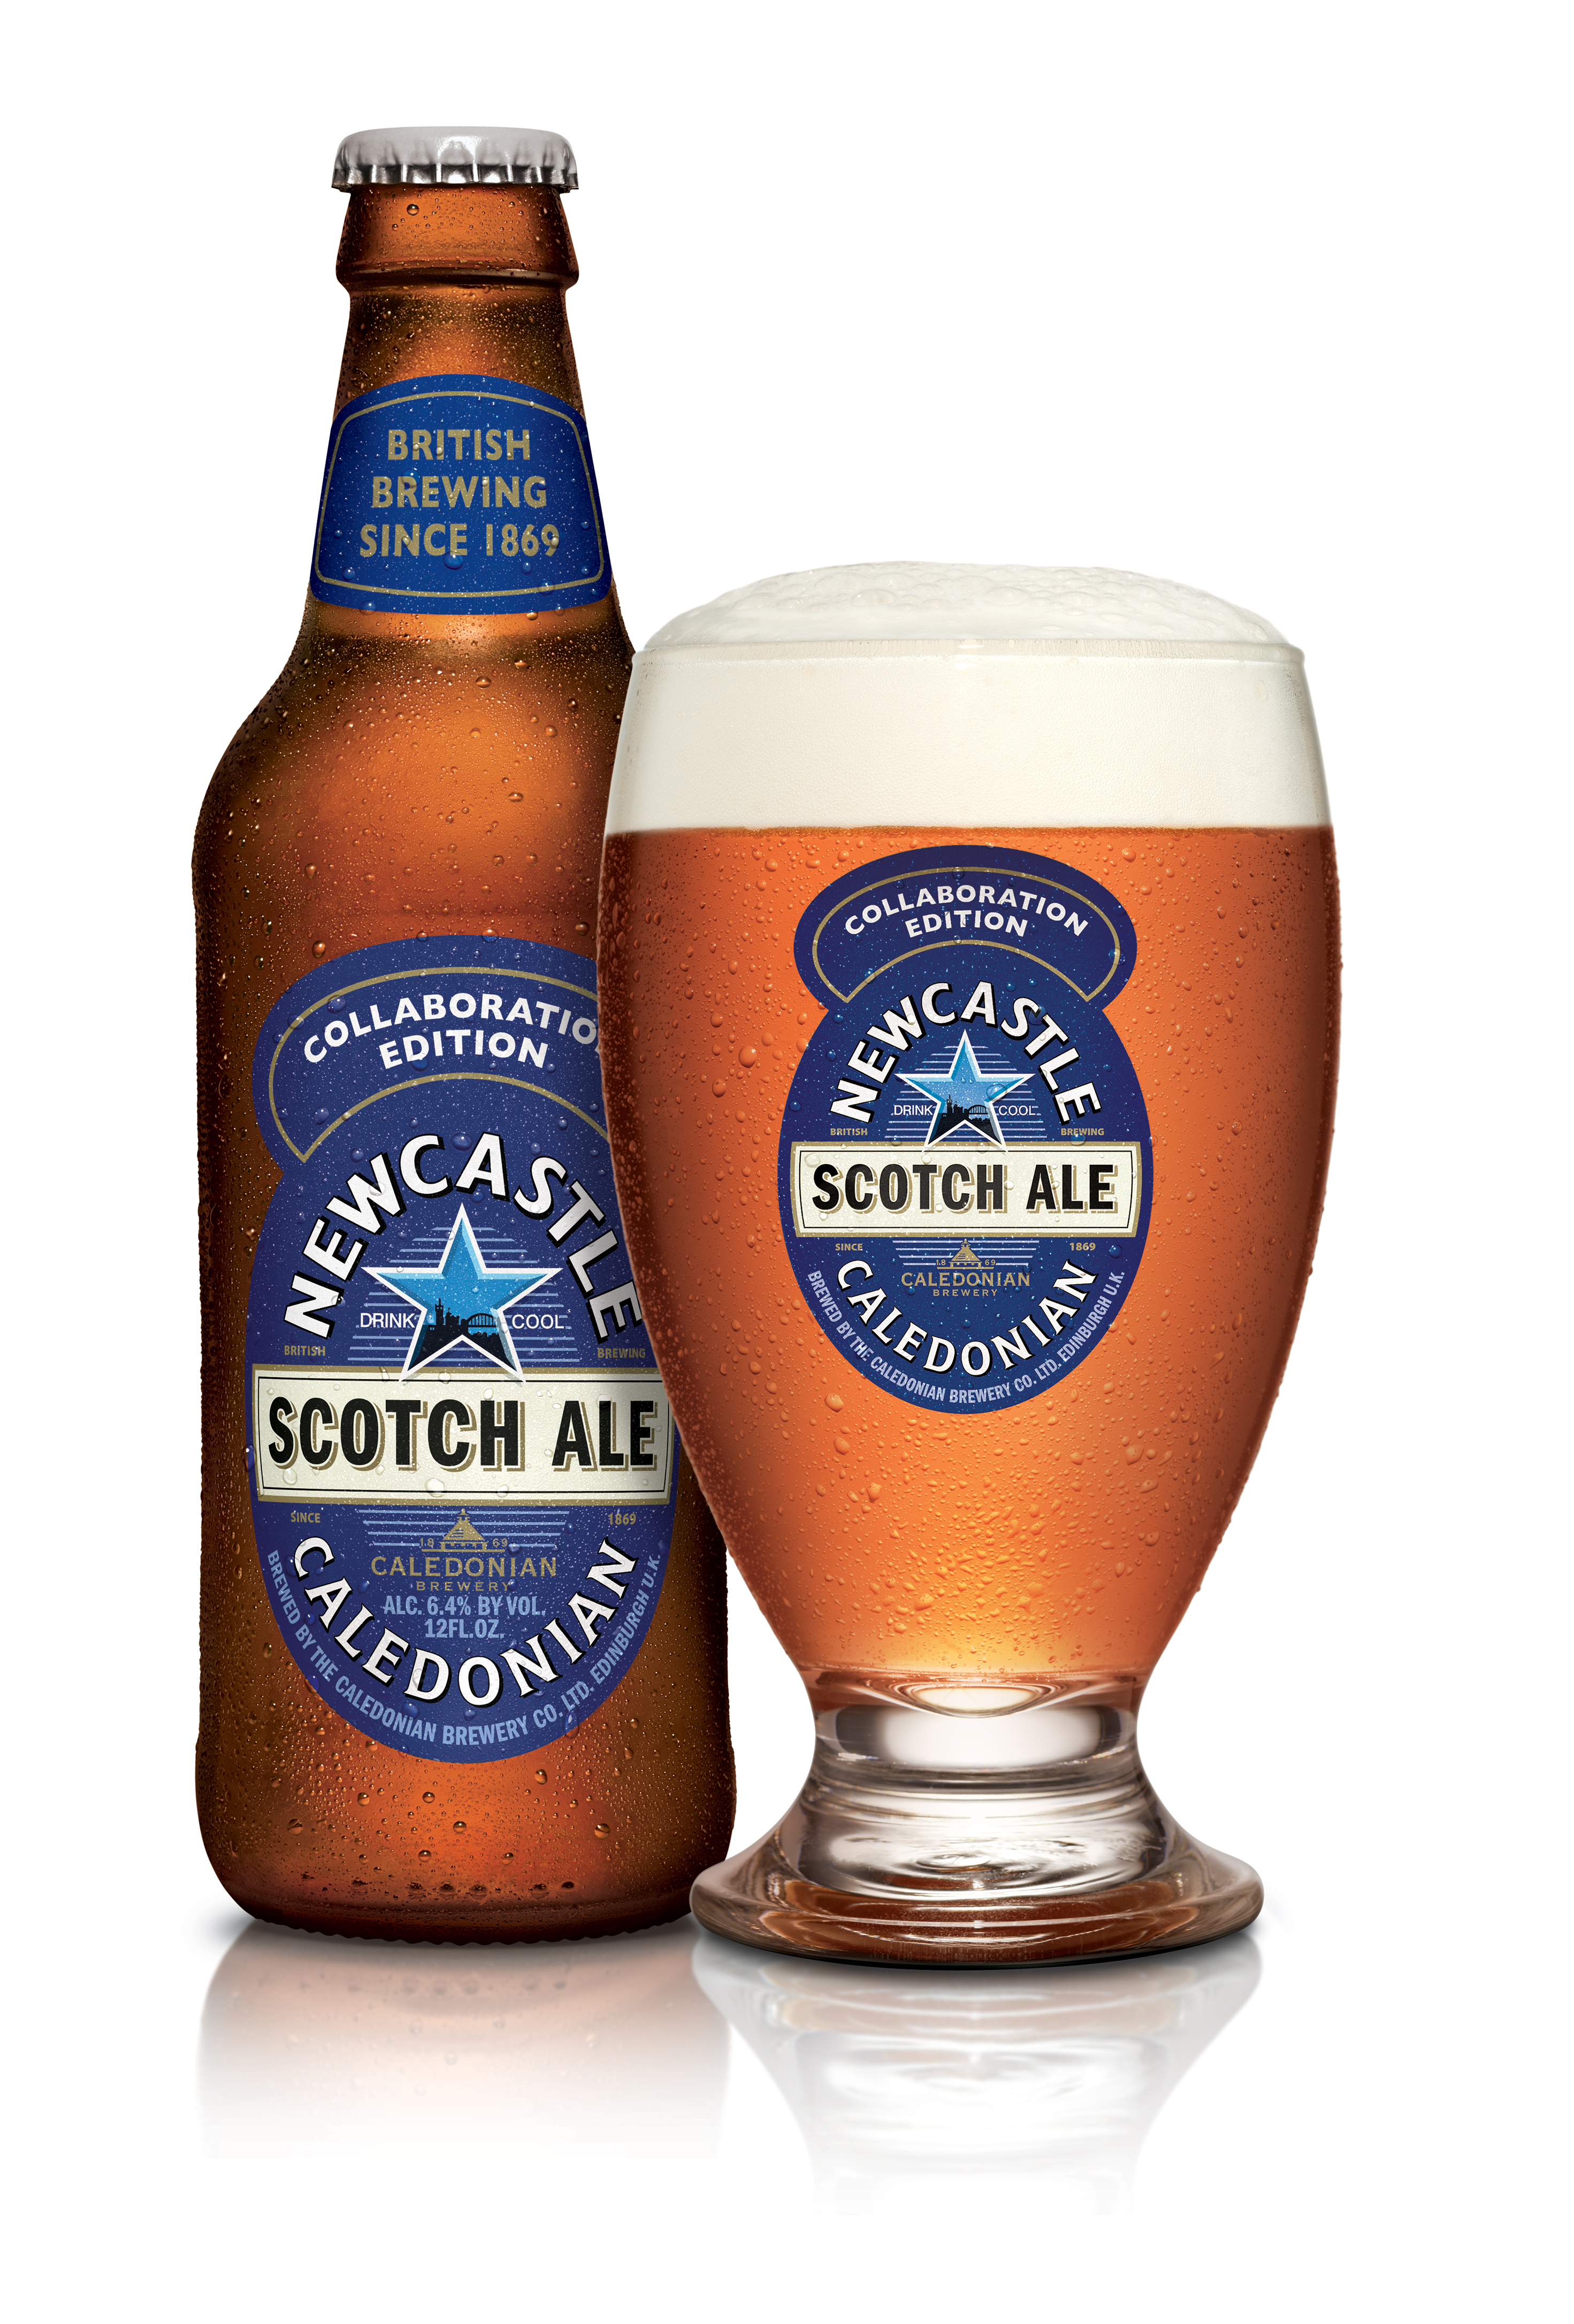 Newcastle Scotch Ale